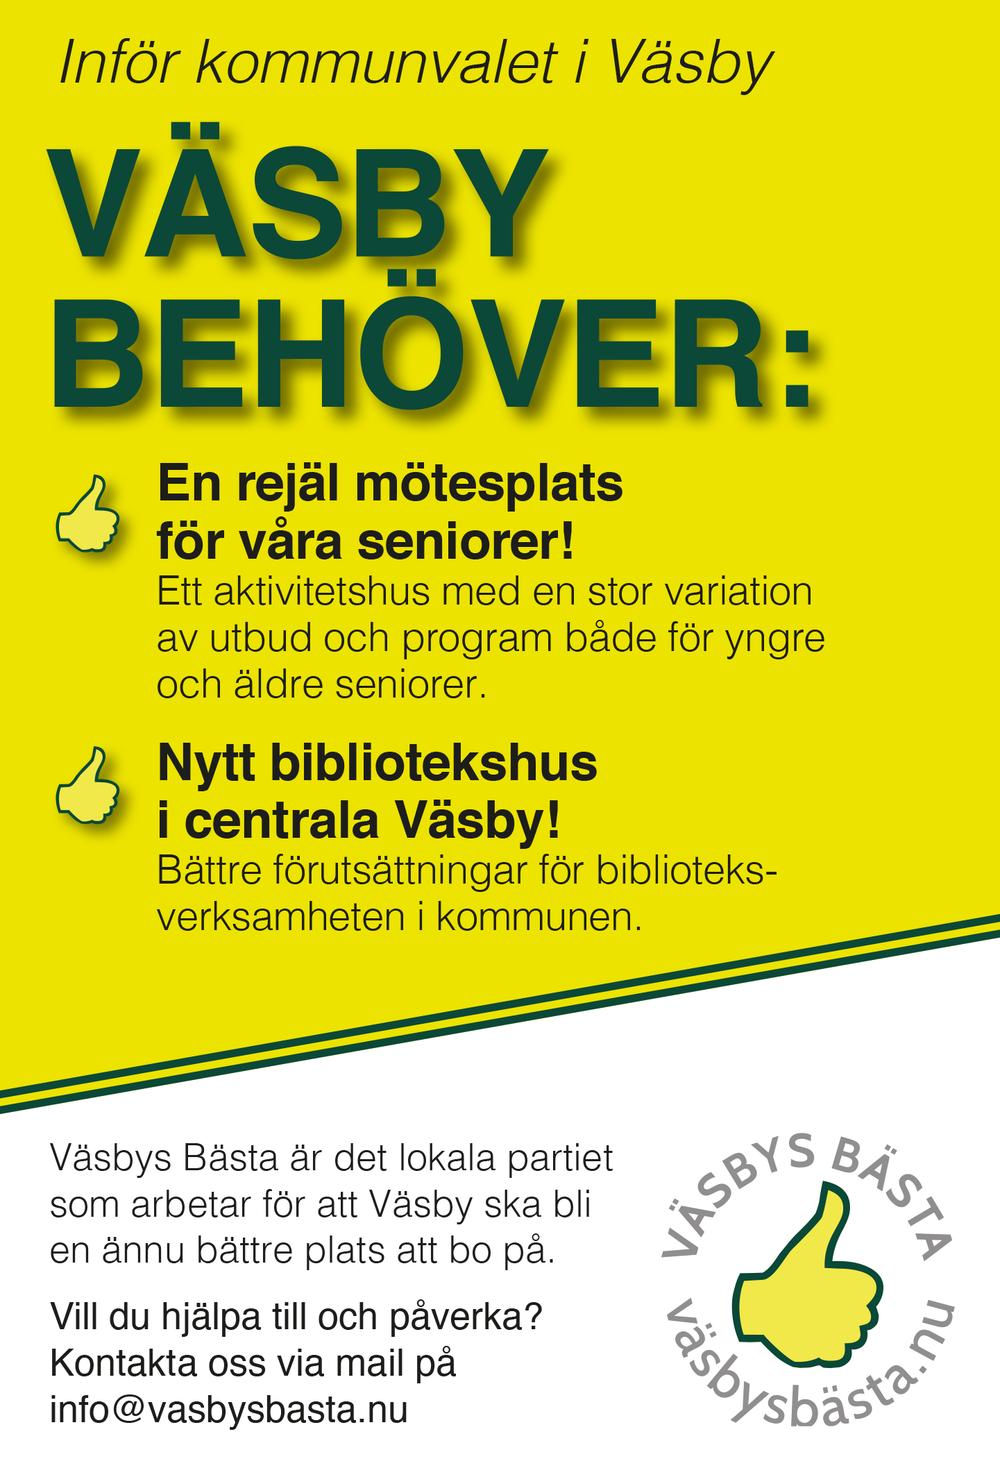 2017-11-27 Kvartssida_flyg_vasbysbasta_171127 Seniorenas hus + bibliotek.png